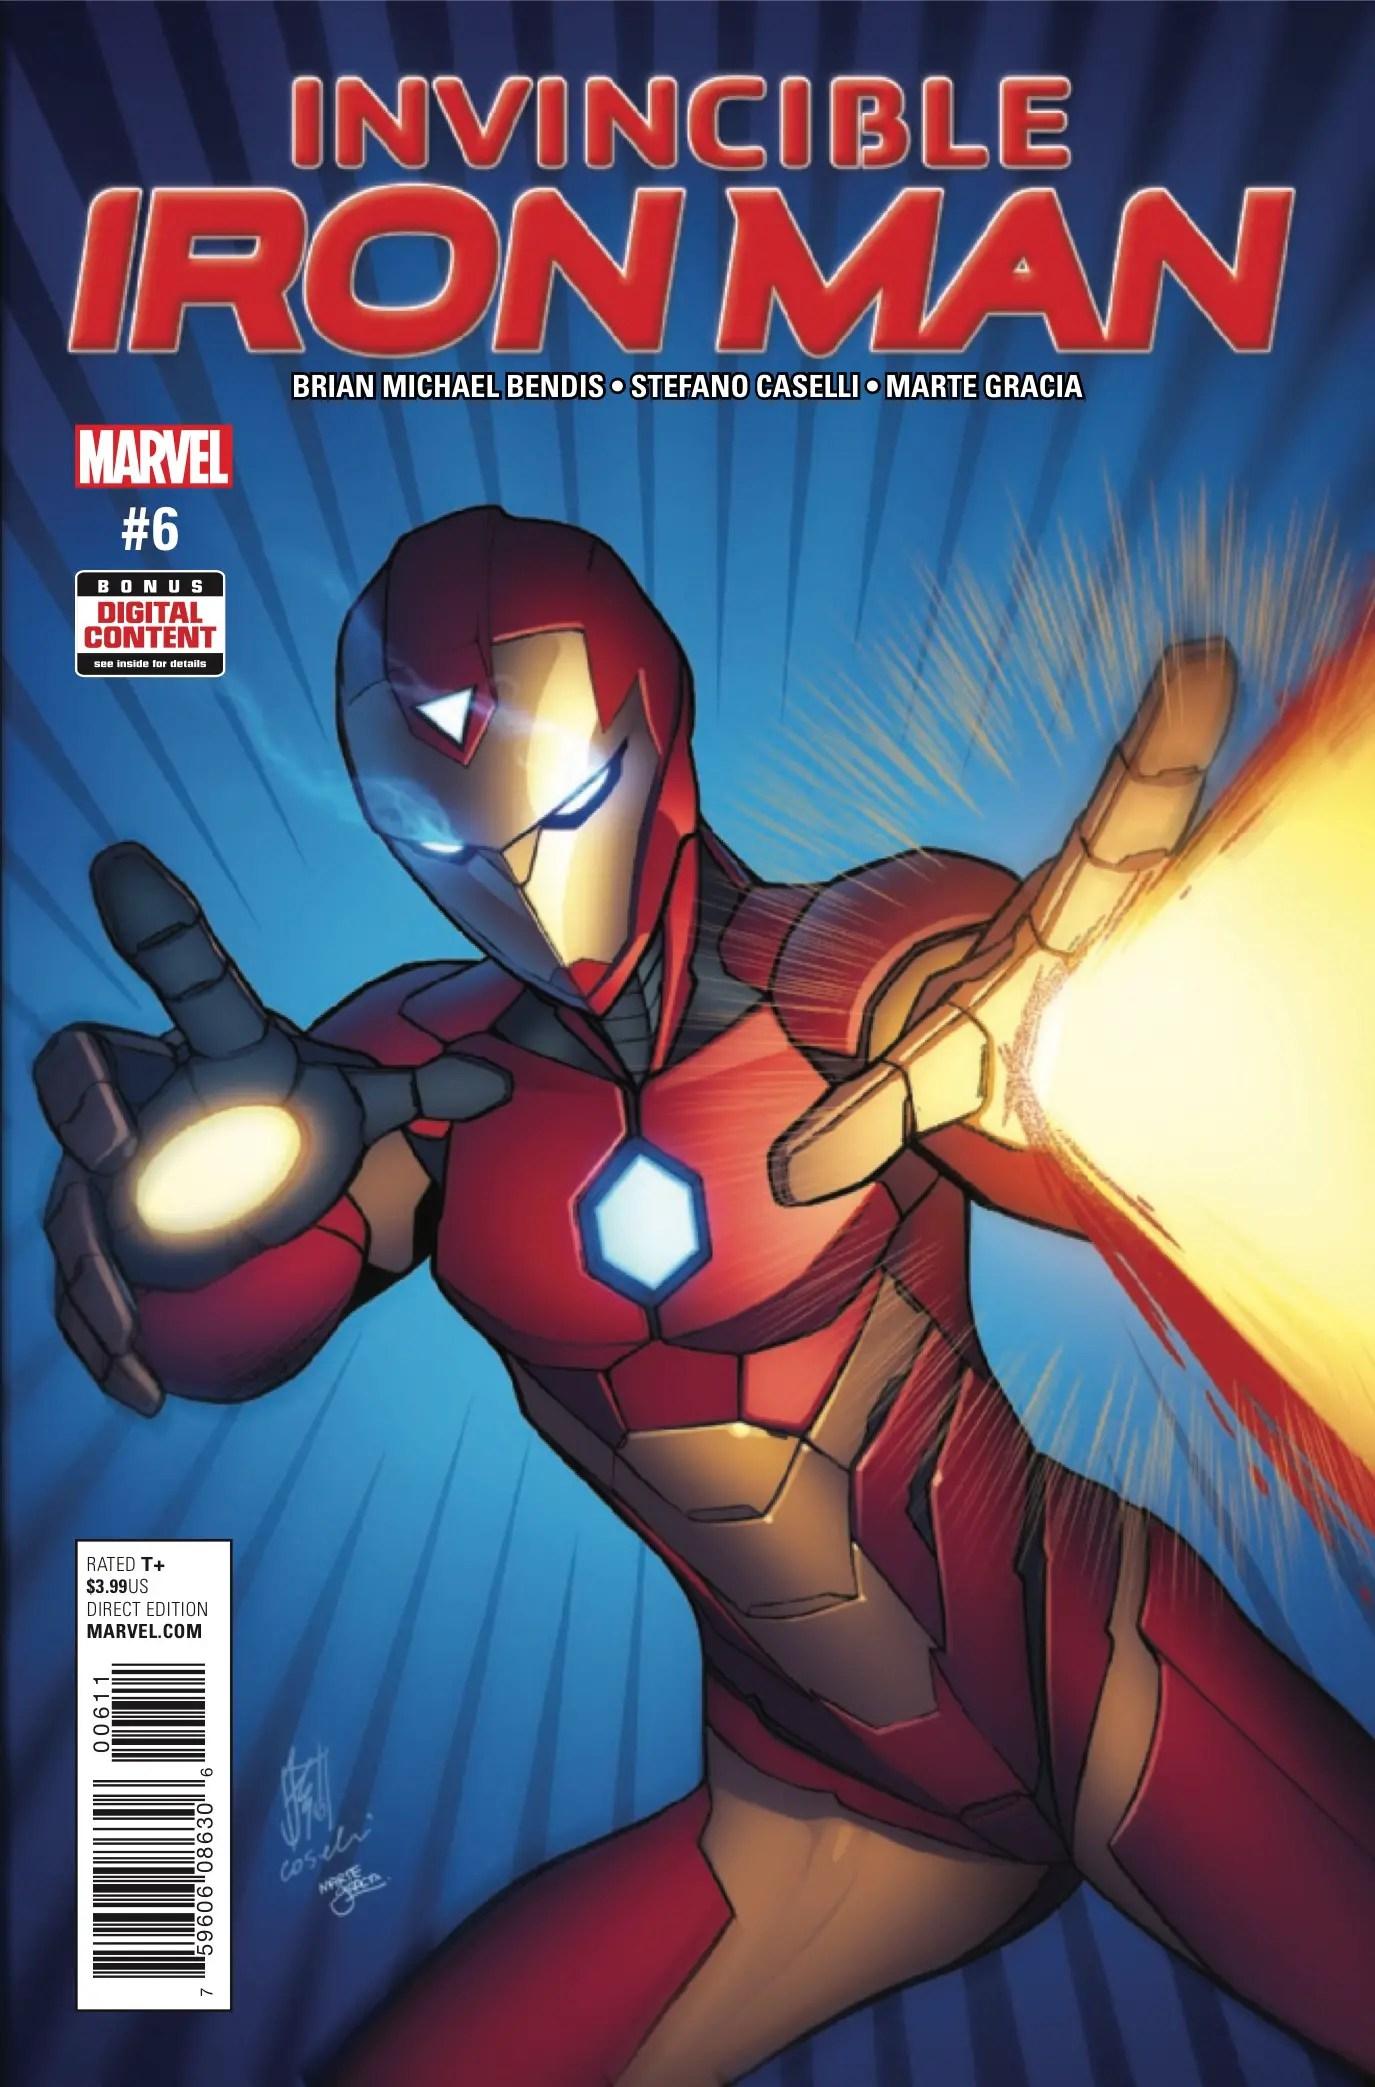 Invincible Iron Man #6 Review